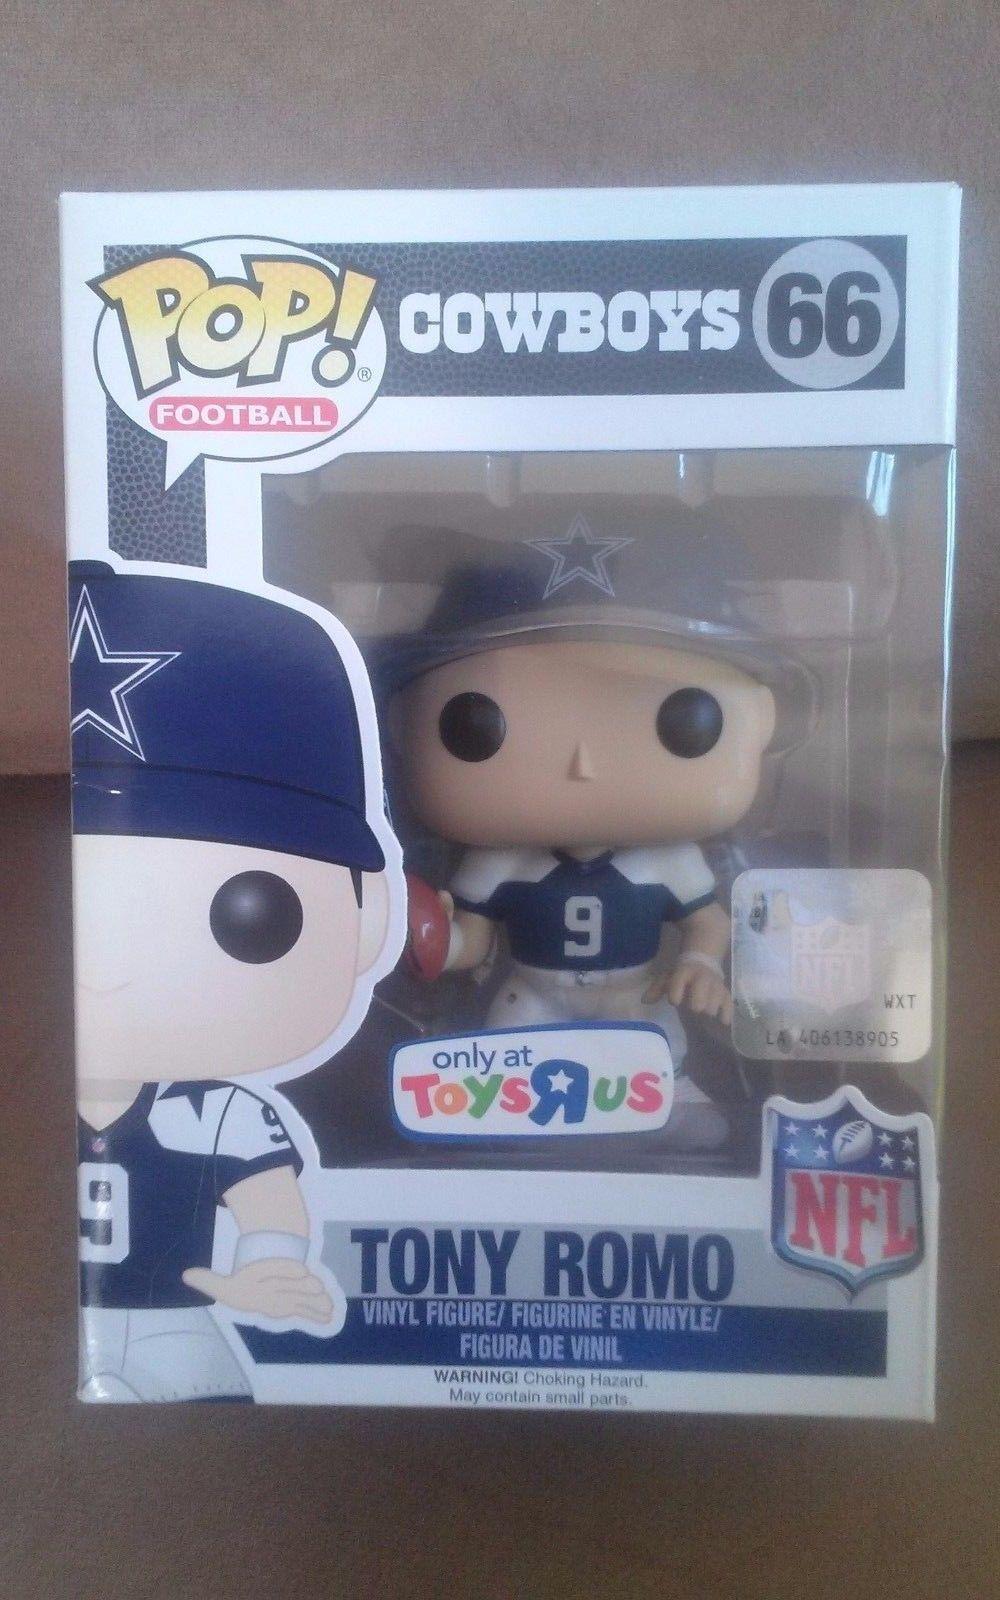 Tony Romo (TRU)